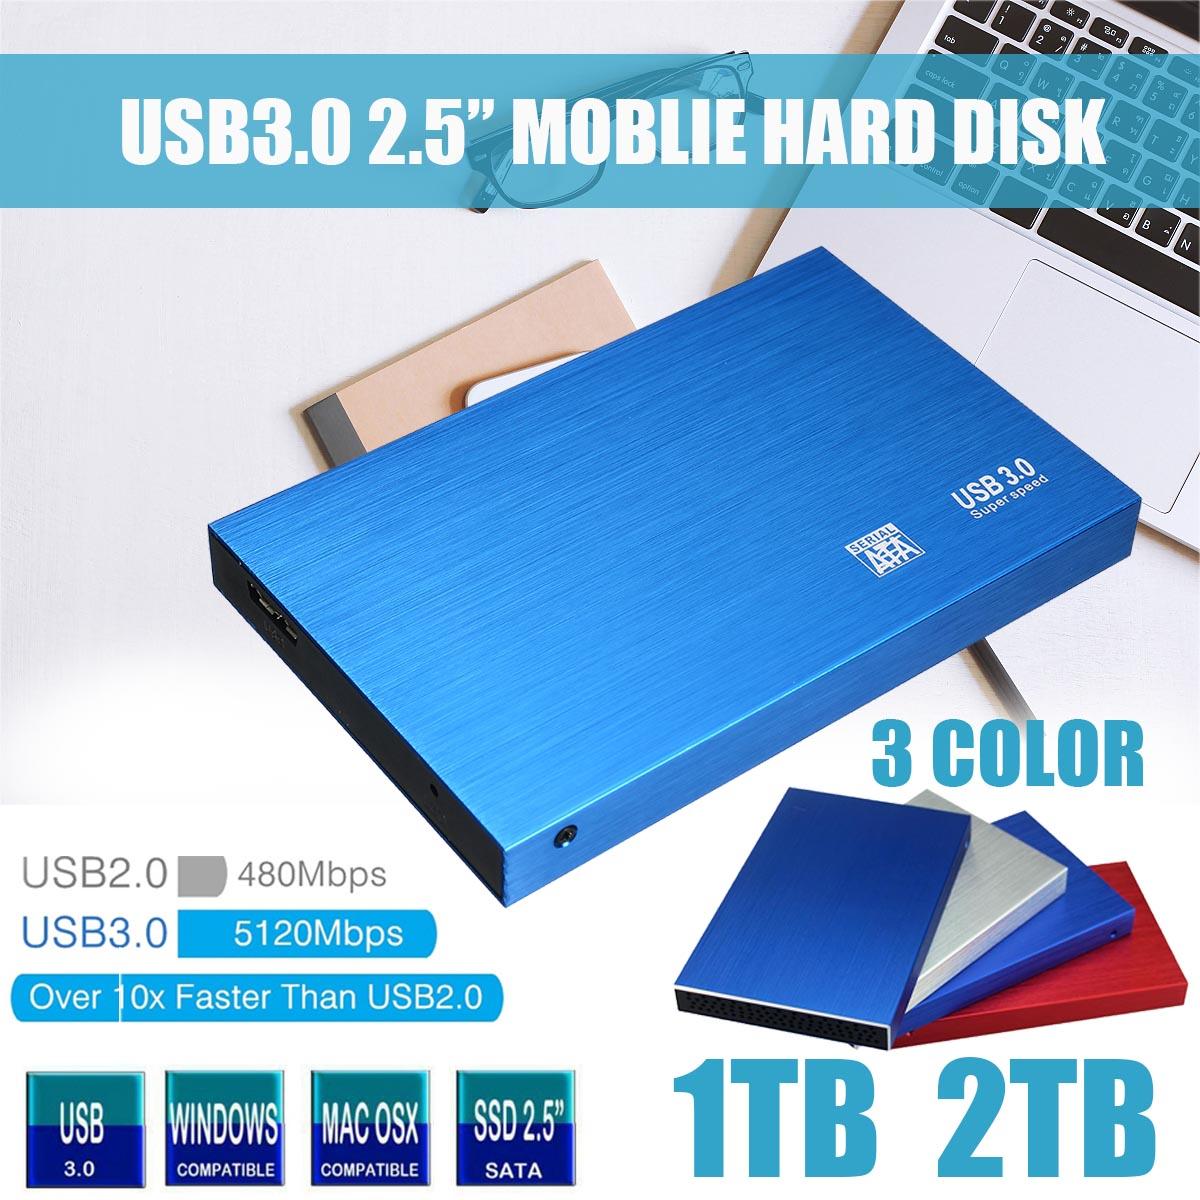 2.5 External Hard Drive 1TB 2TB Storage USB3.0 HDD Anti-vibration And Anti-fall Mobile Hard Disk For Mac Xbox PS4 TV Box